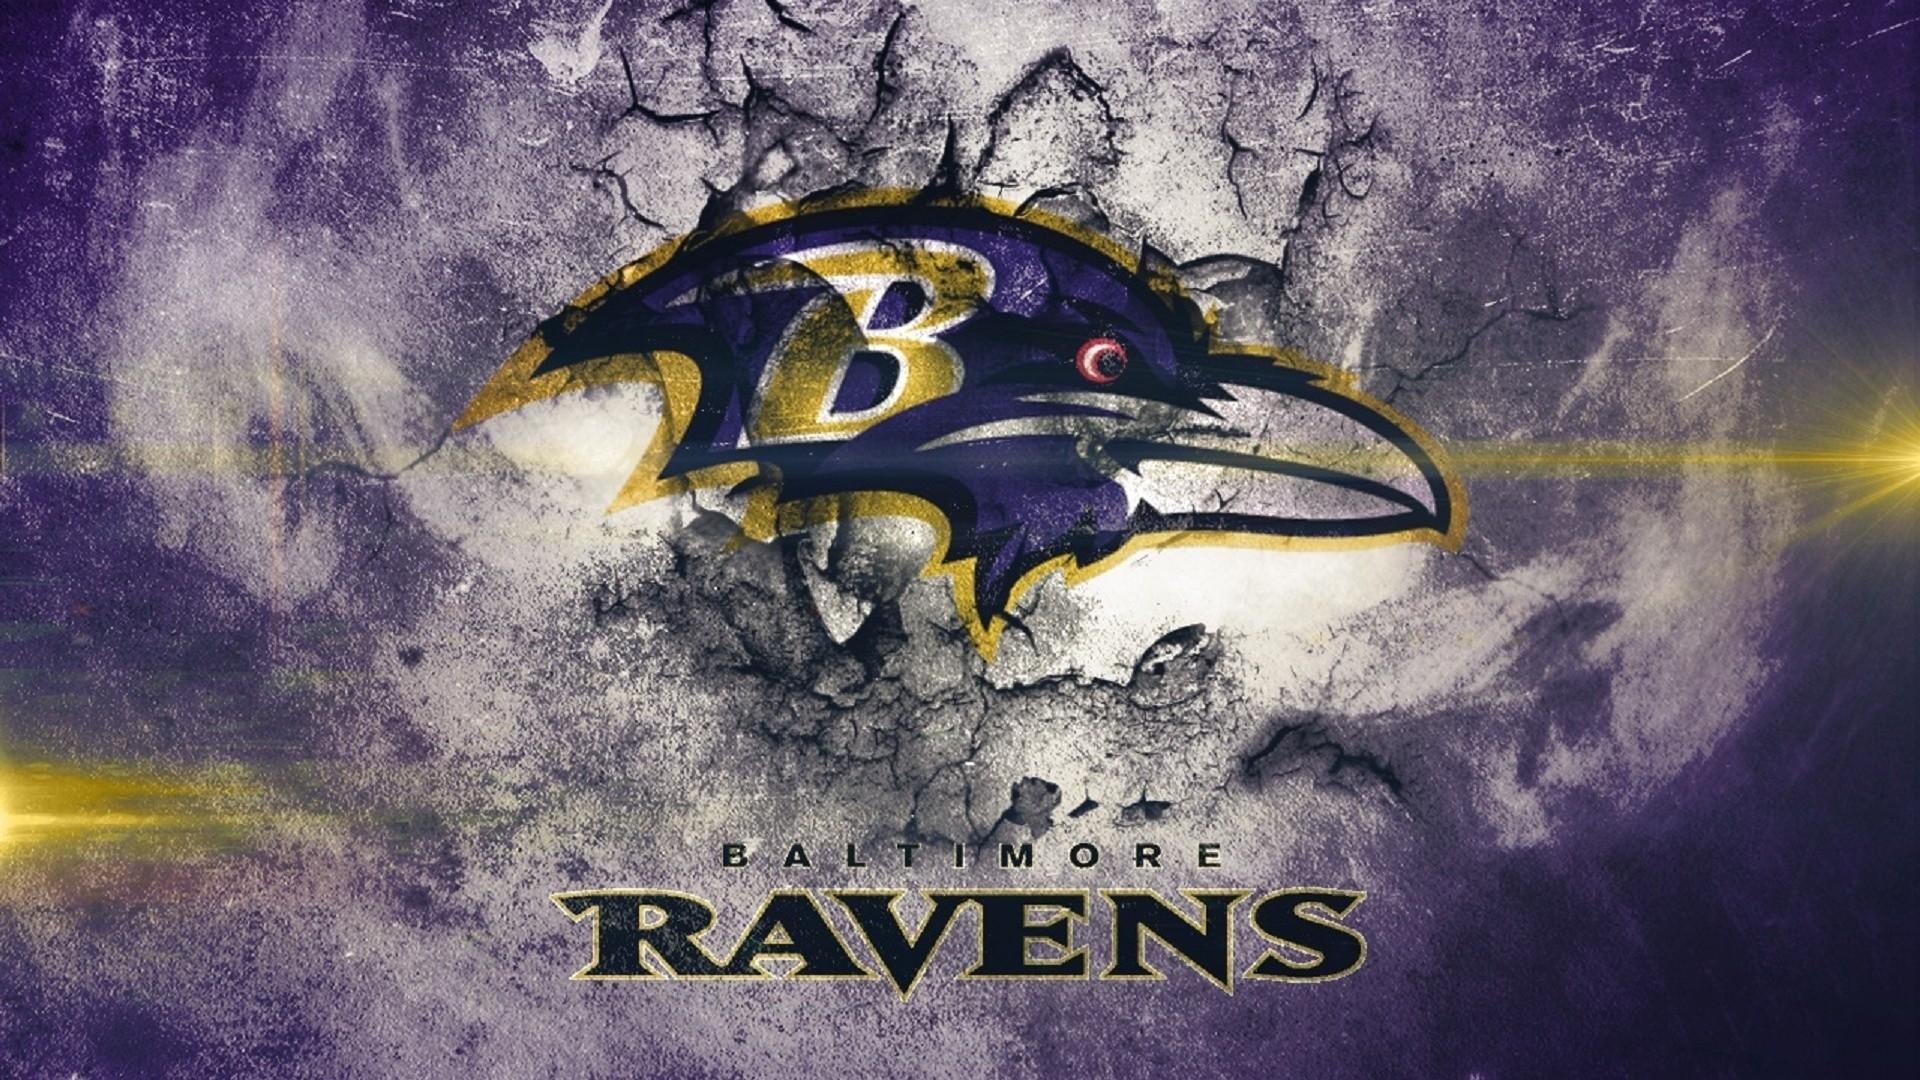 Free Download Ravens Wallpapers HD.